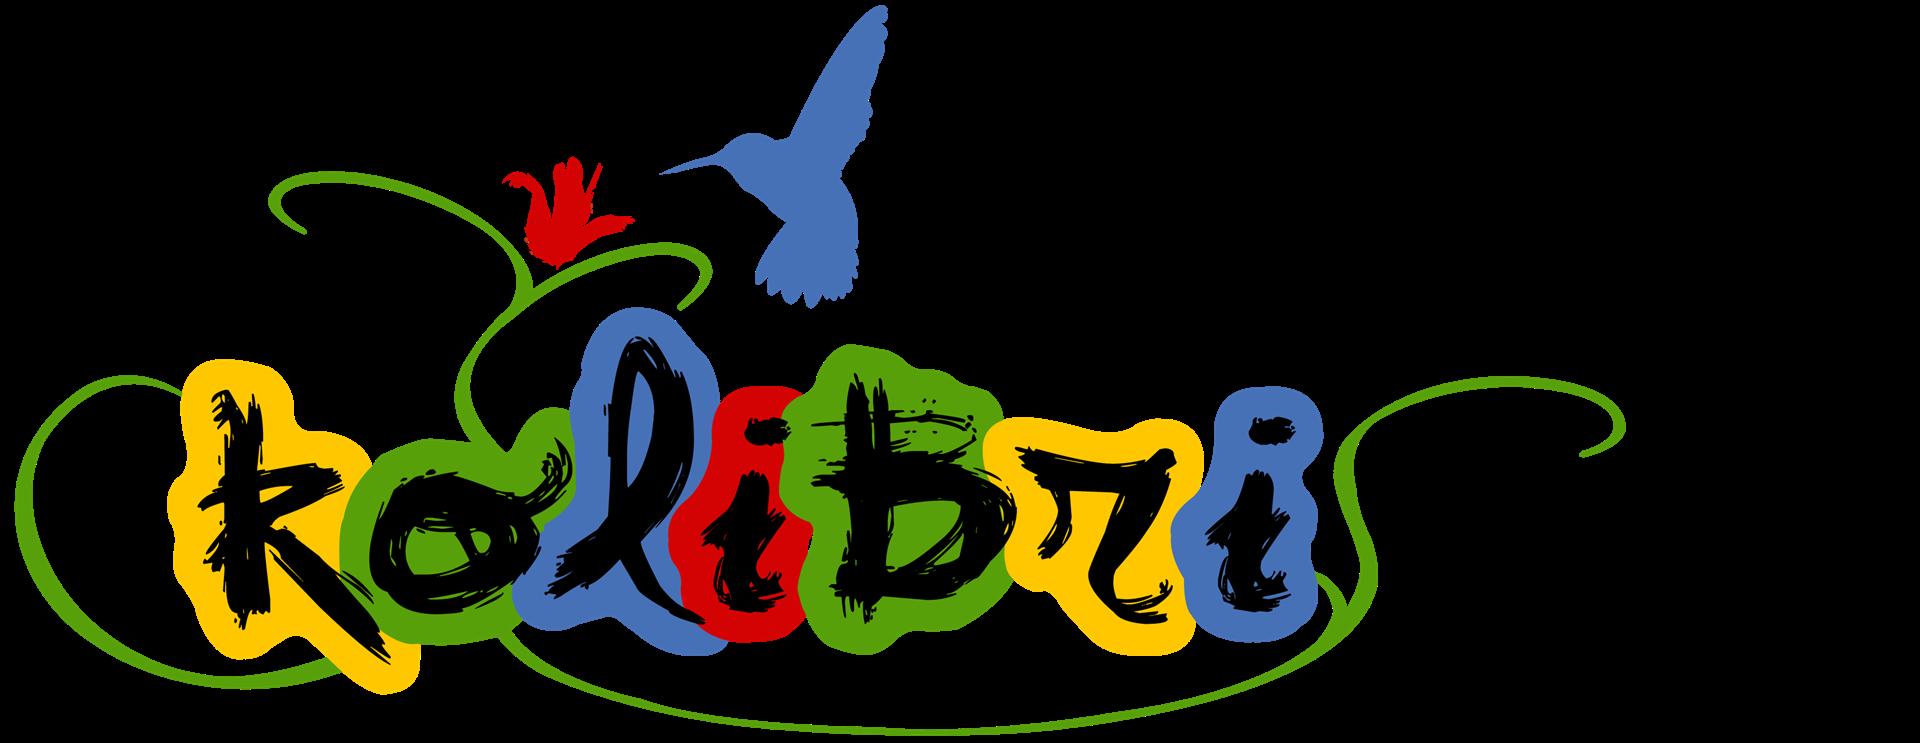 Image of the Kolibri logo (CARF - Children At Risk Foundation)